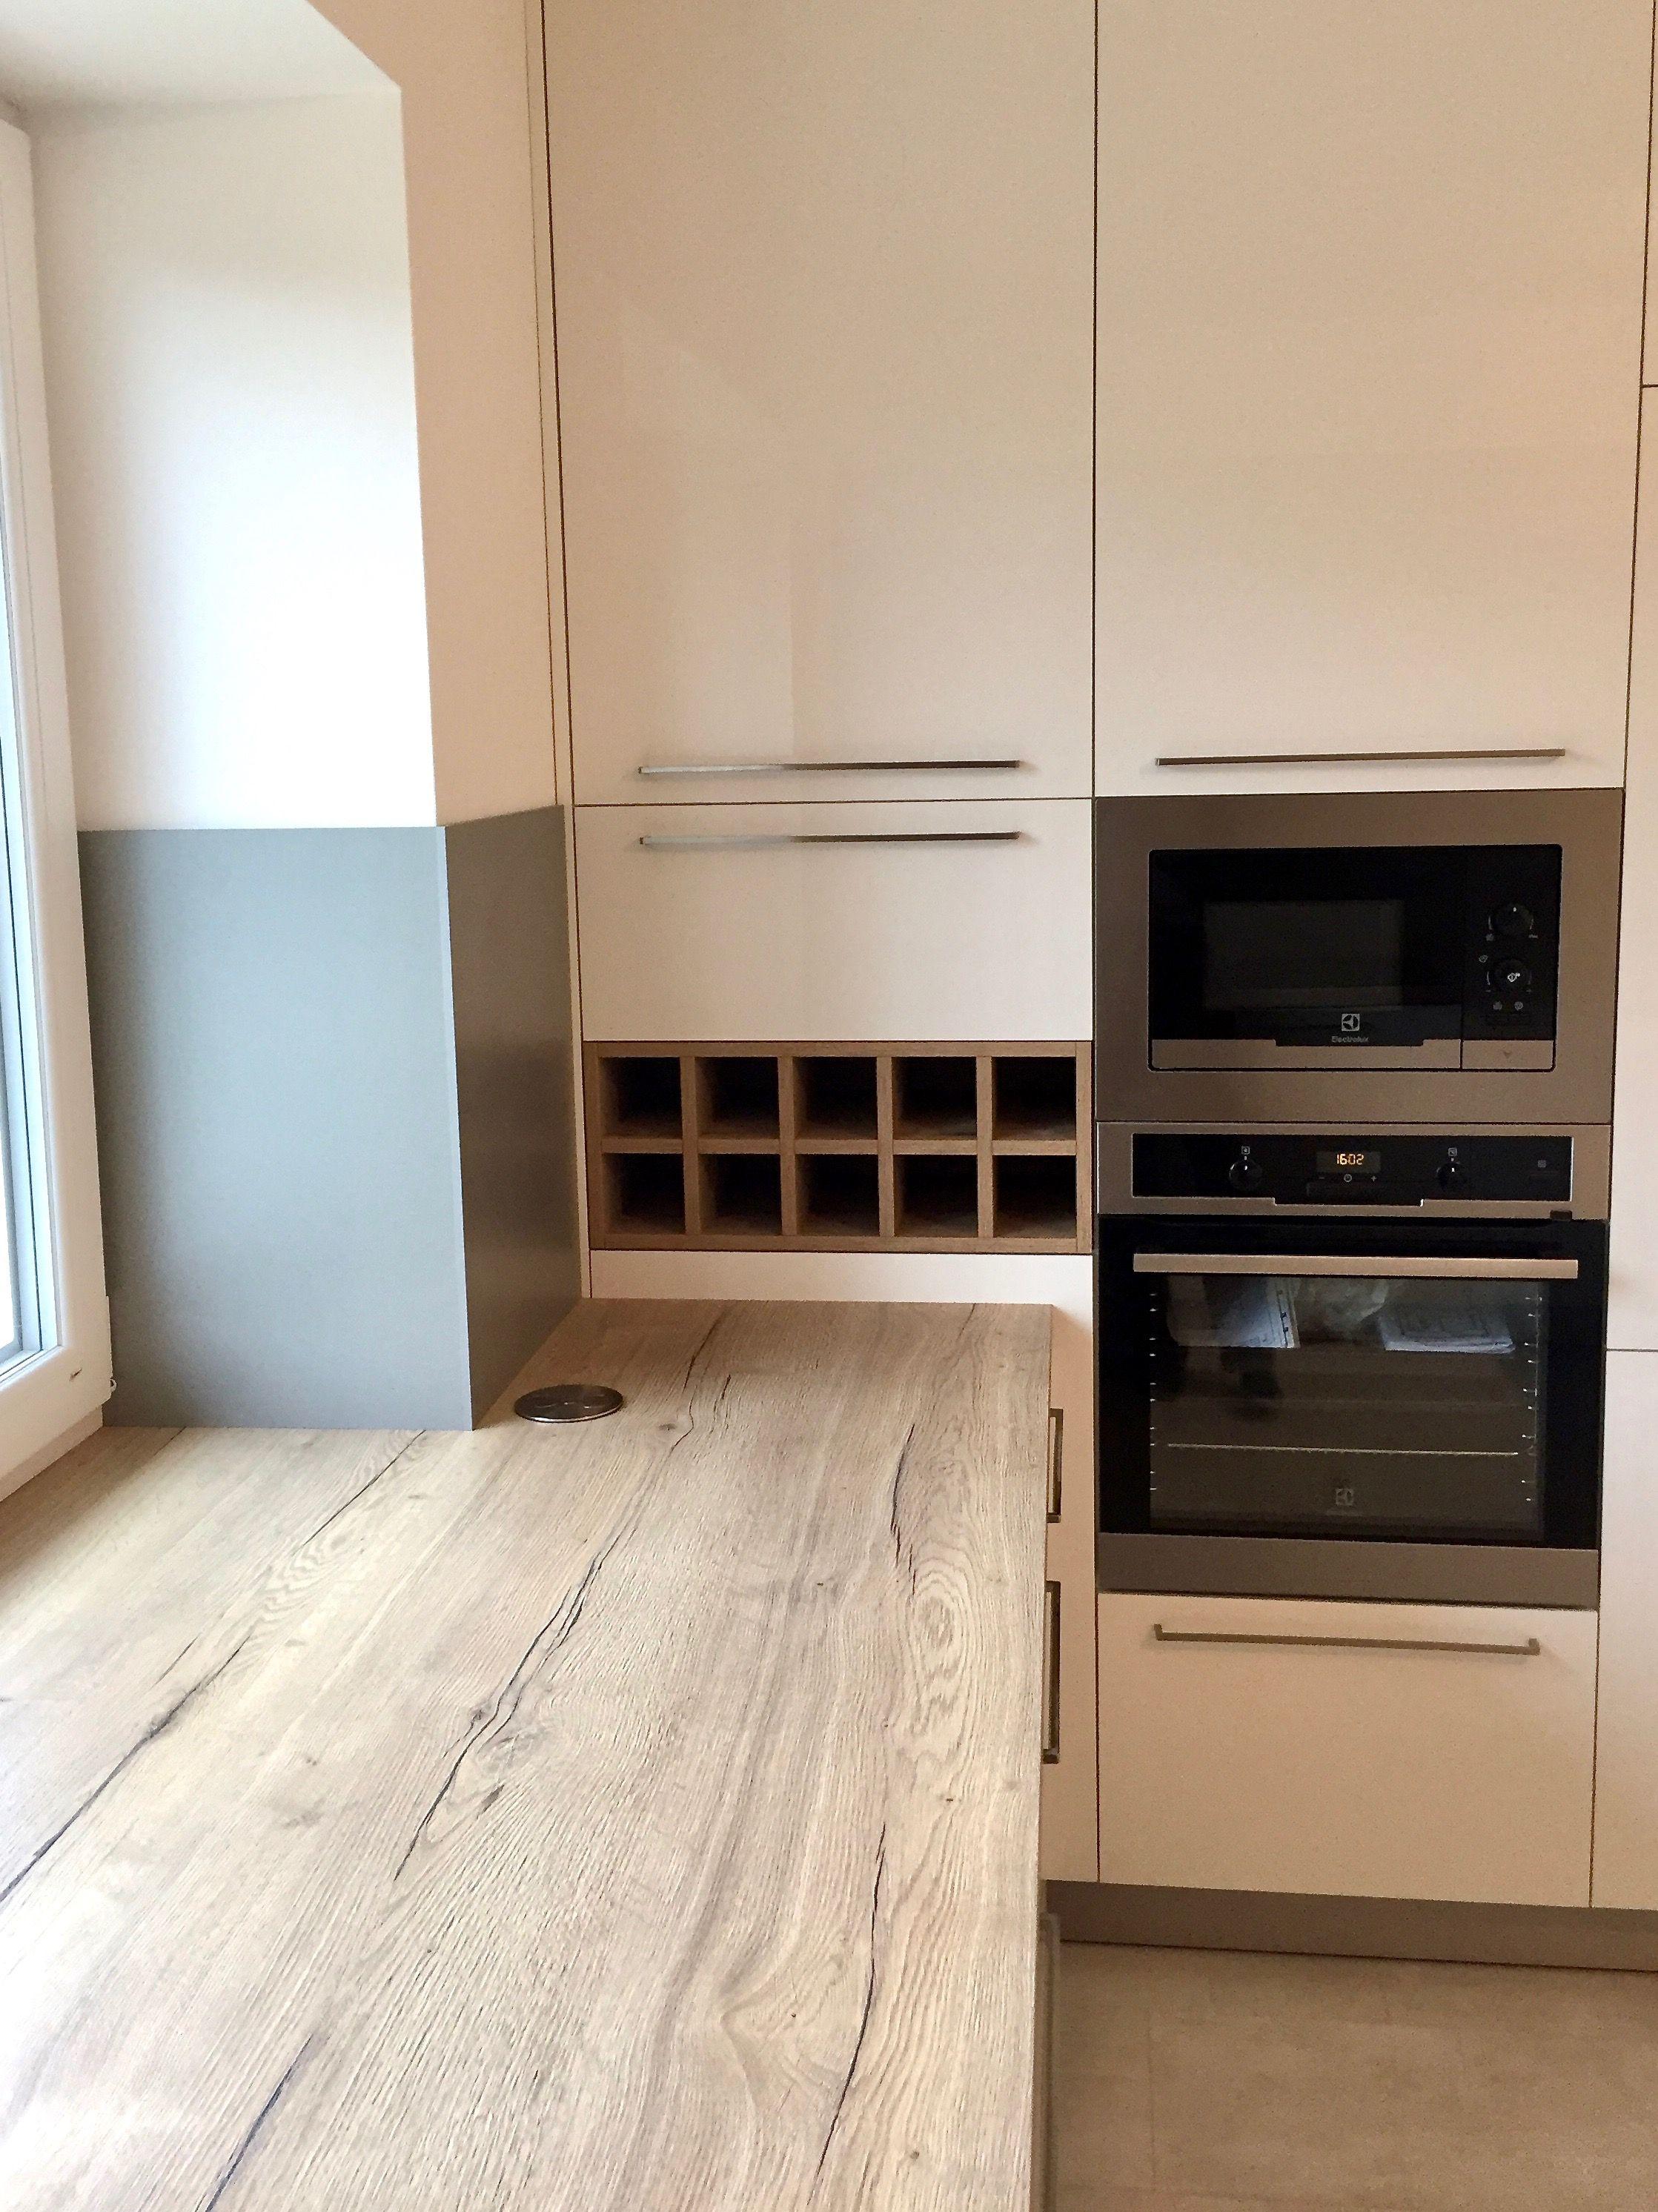 Modern kuchyň Dub Halifax Egger H1180 bl½ lesk